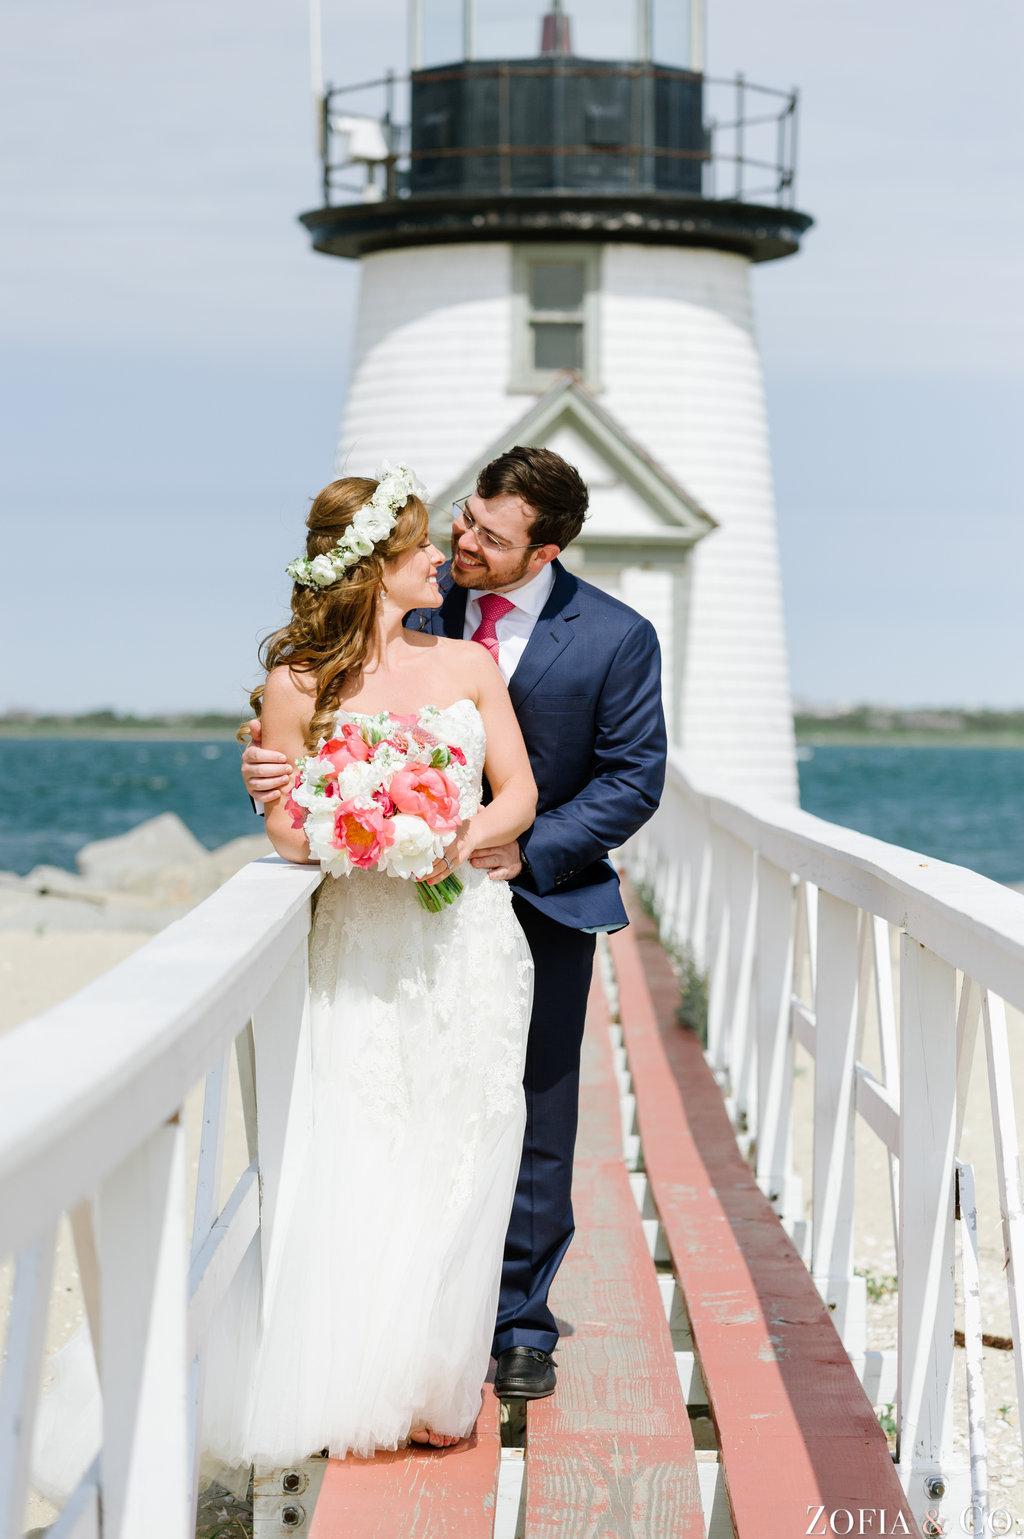 Ceci_New_York_Style_Luxury_Custom_Summer_Wedding_CeciBride_Nautical_Blue_Gold_Letterpress_Foil_160.jpg